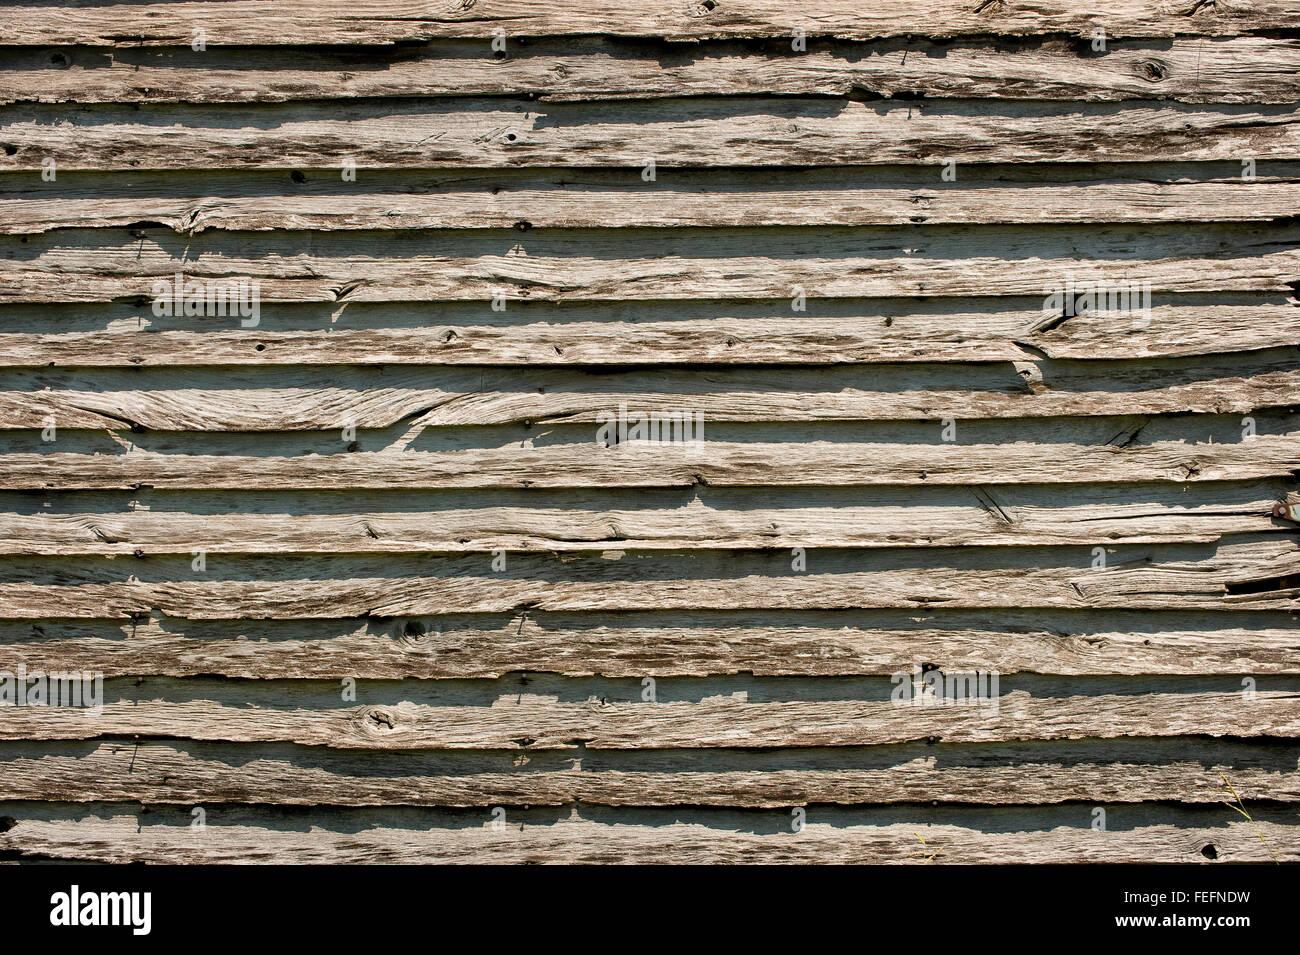 Century Old Barn Siding - Stock Image